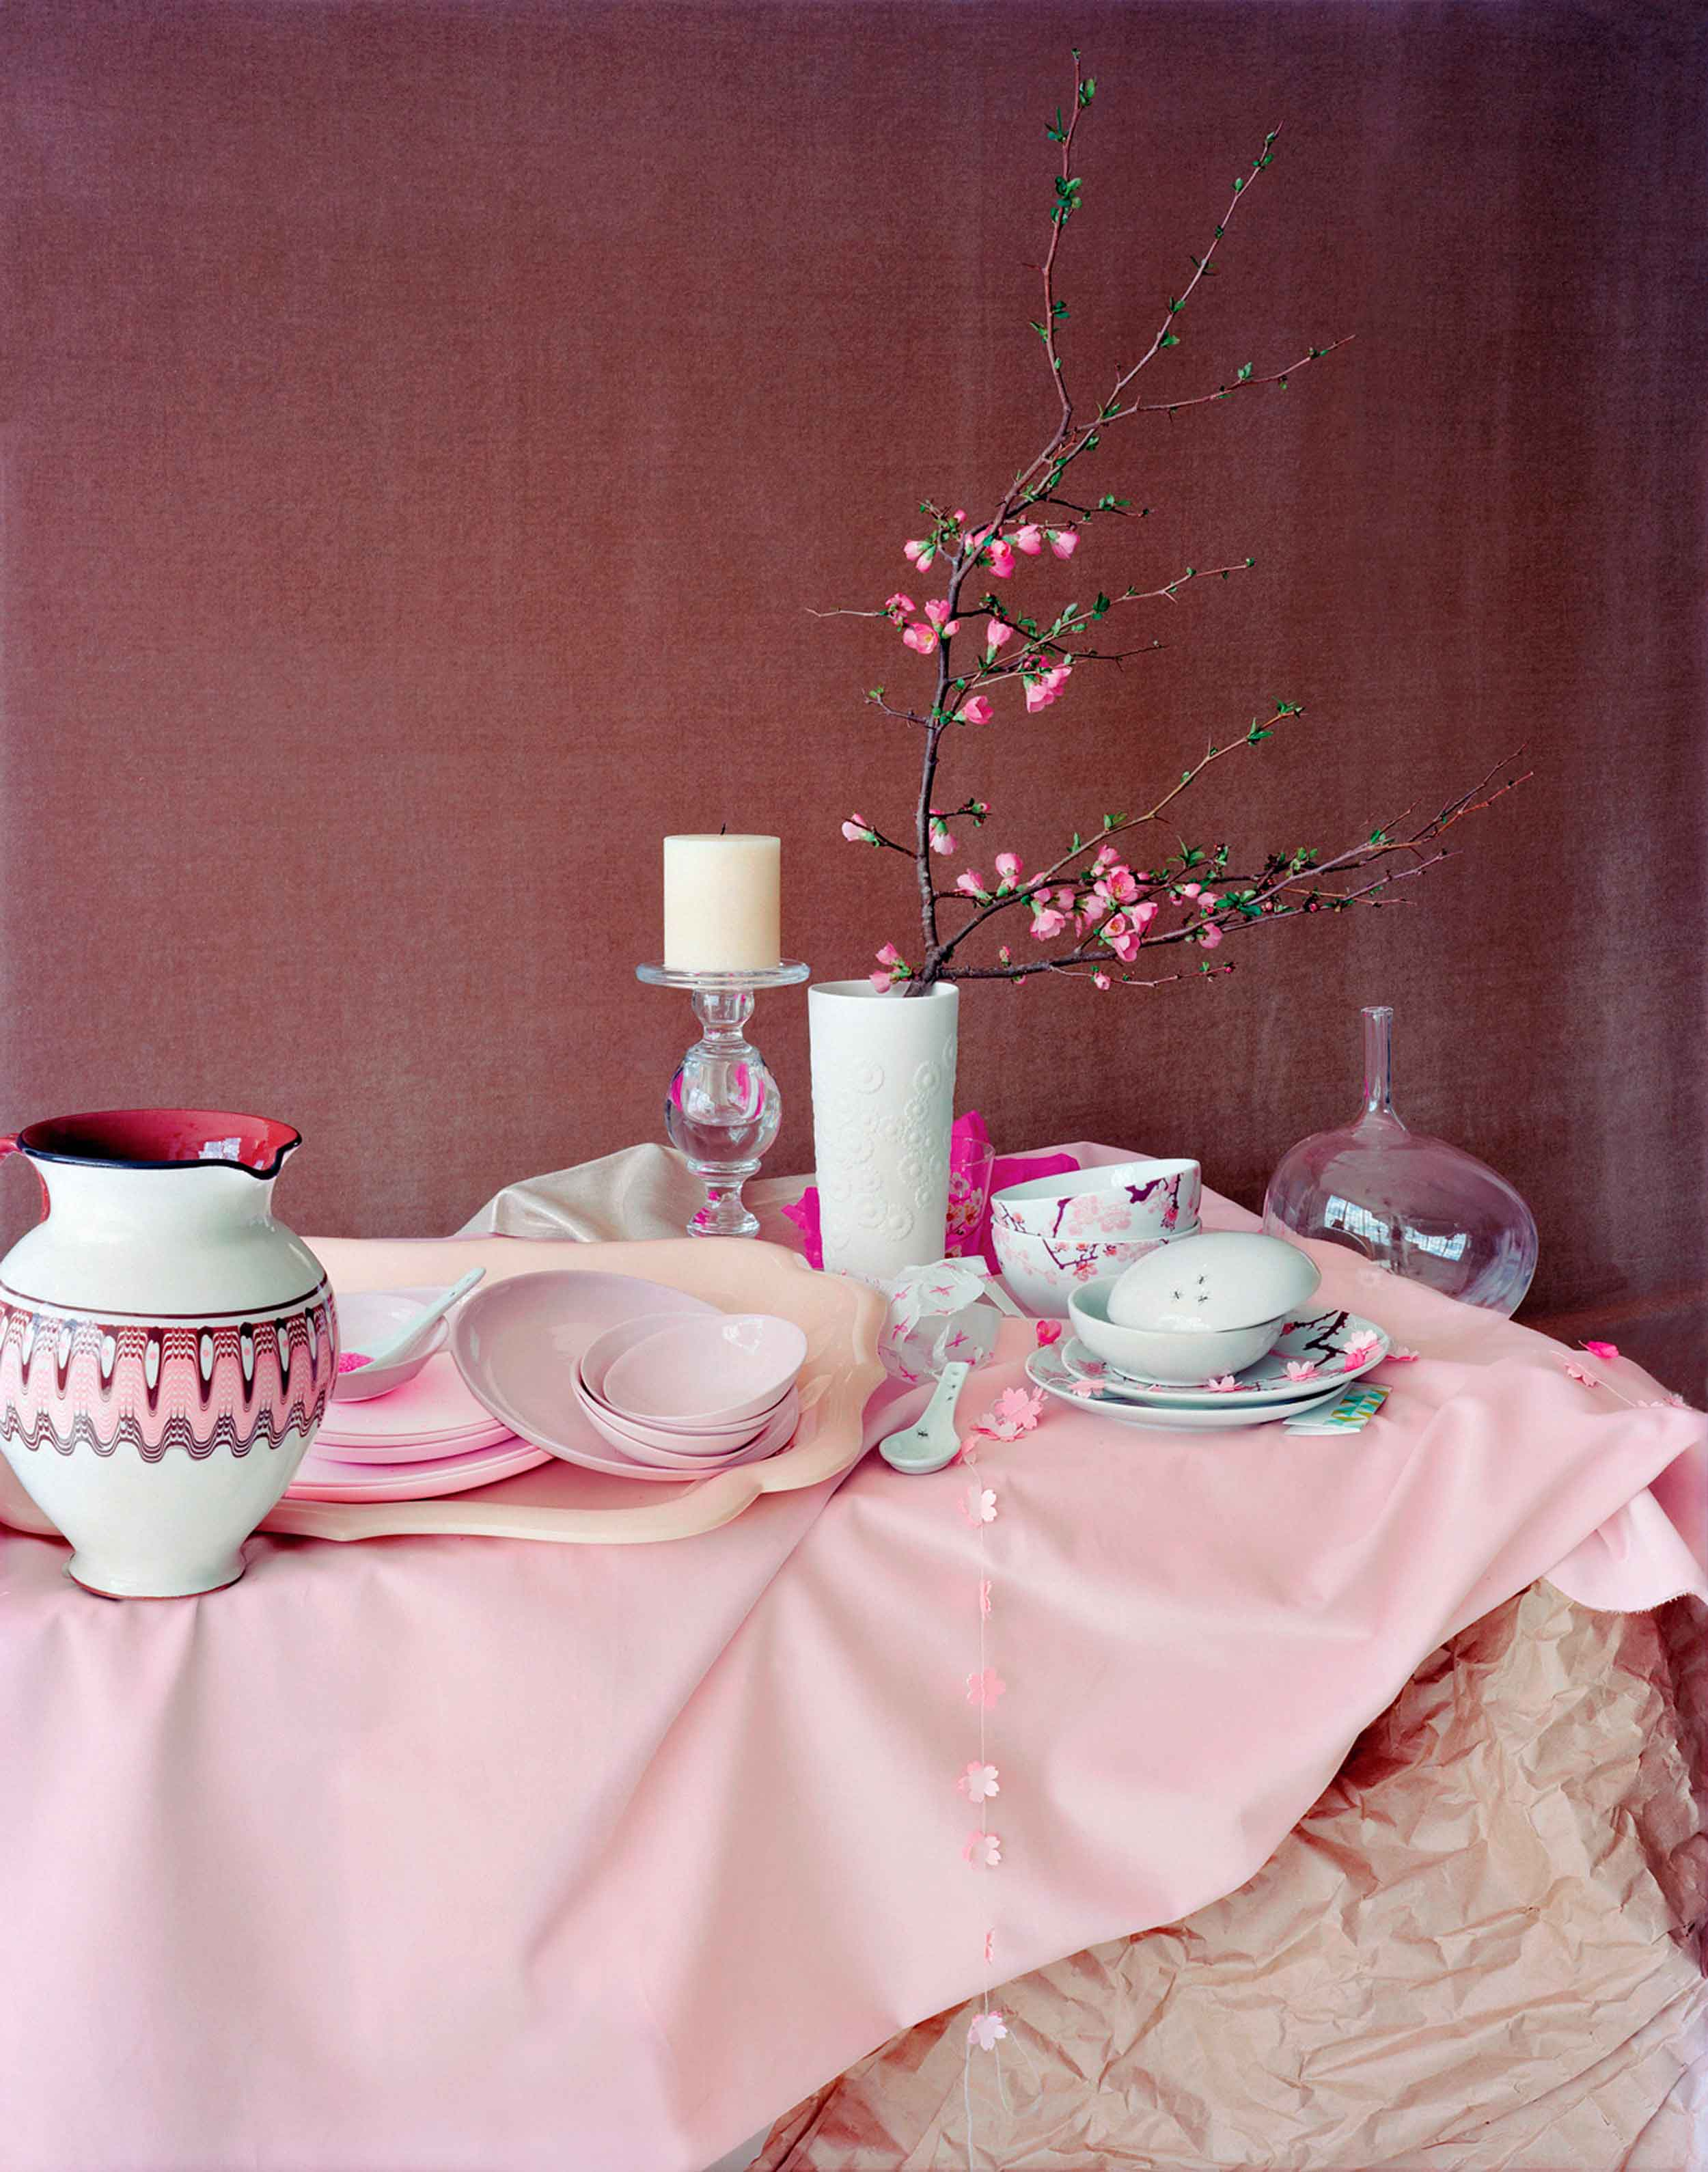 brides-tabletop-laura-letinsky-4.jpg